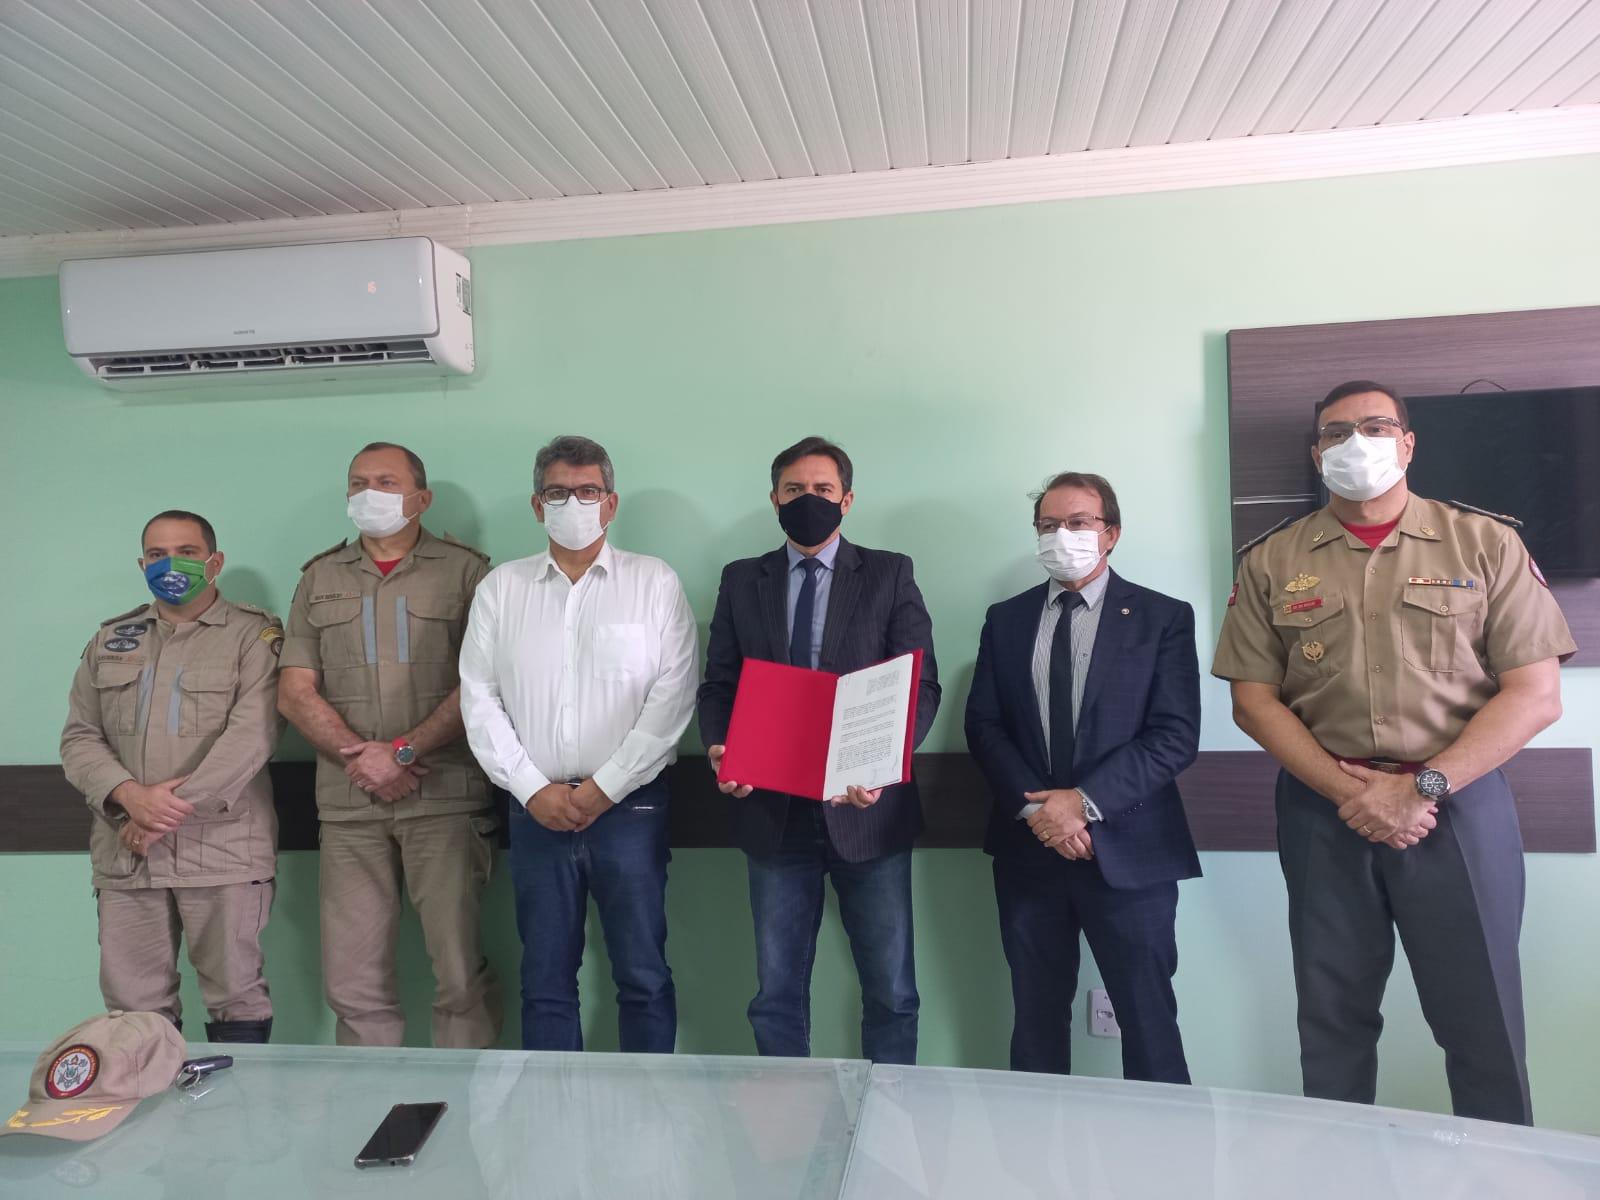 Unidade do Corpo de Bombeiros Militar é confirmada para Cuité